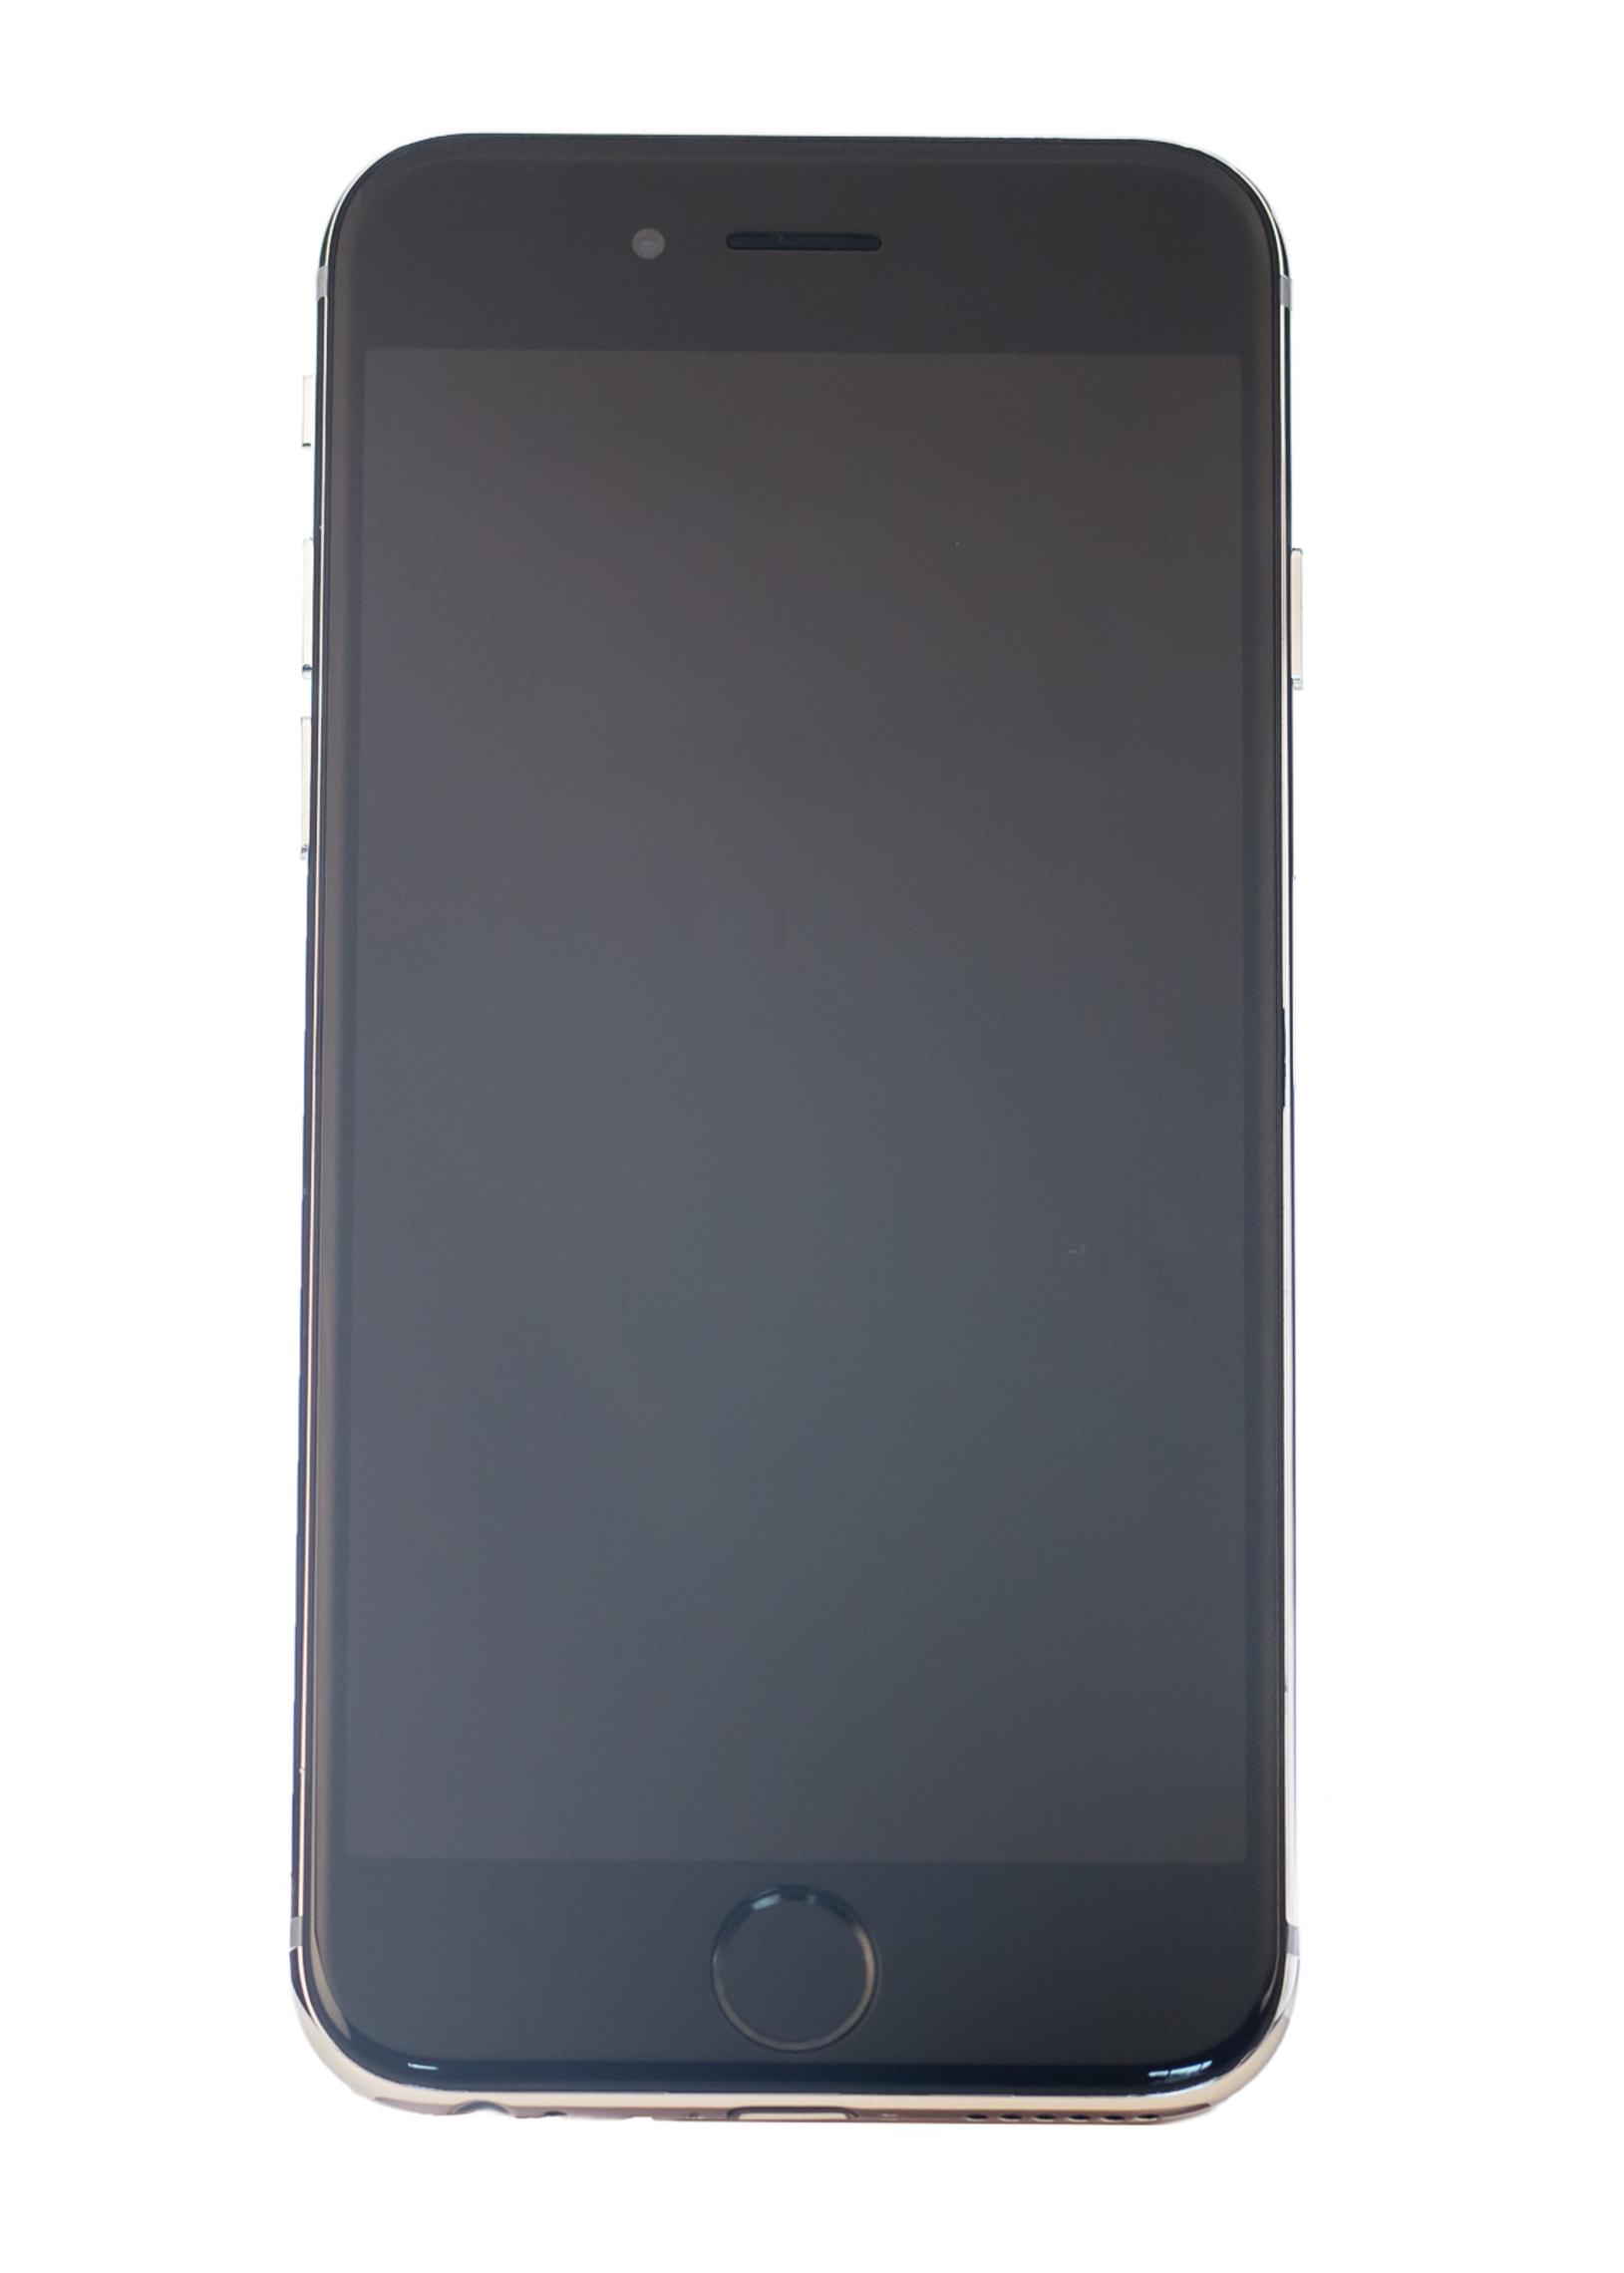 950 Platinum iPhone 6s Plus (By Julian Monroe London)